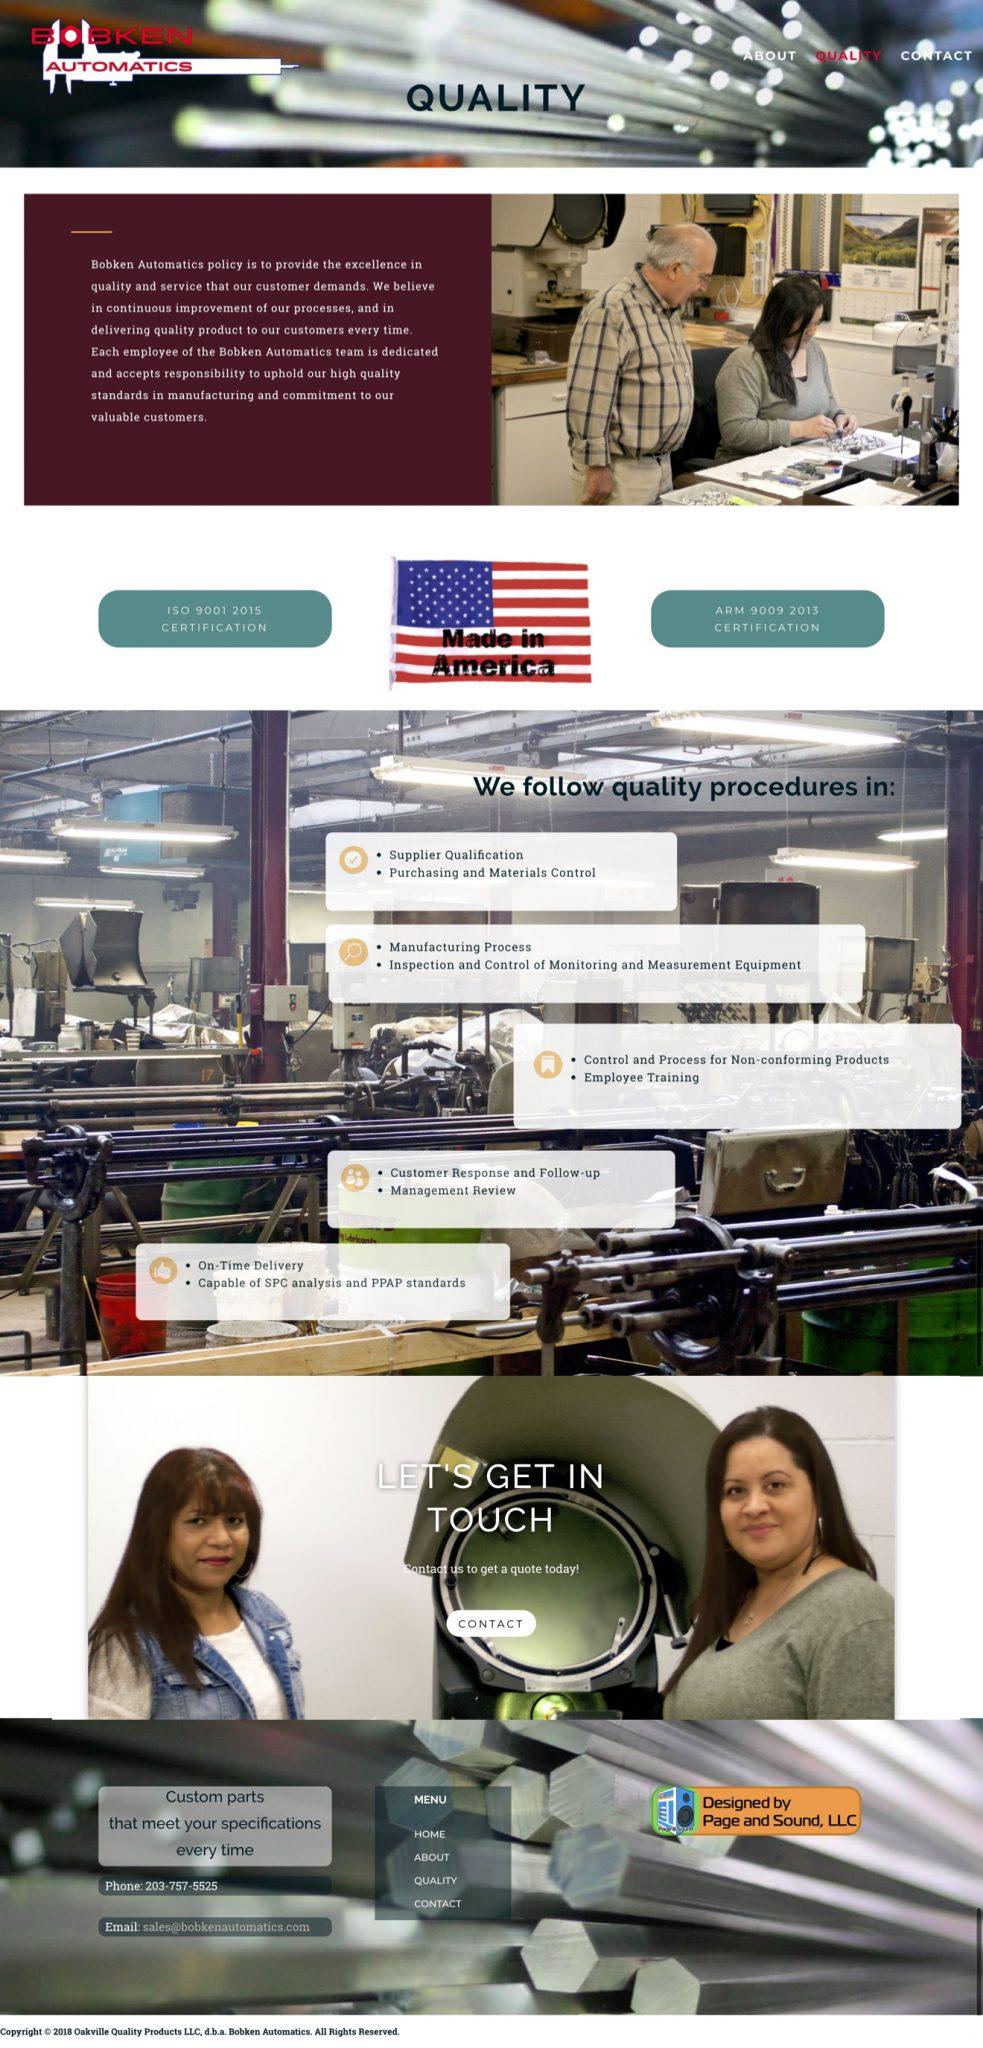 New Quality Page Screenshot